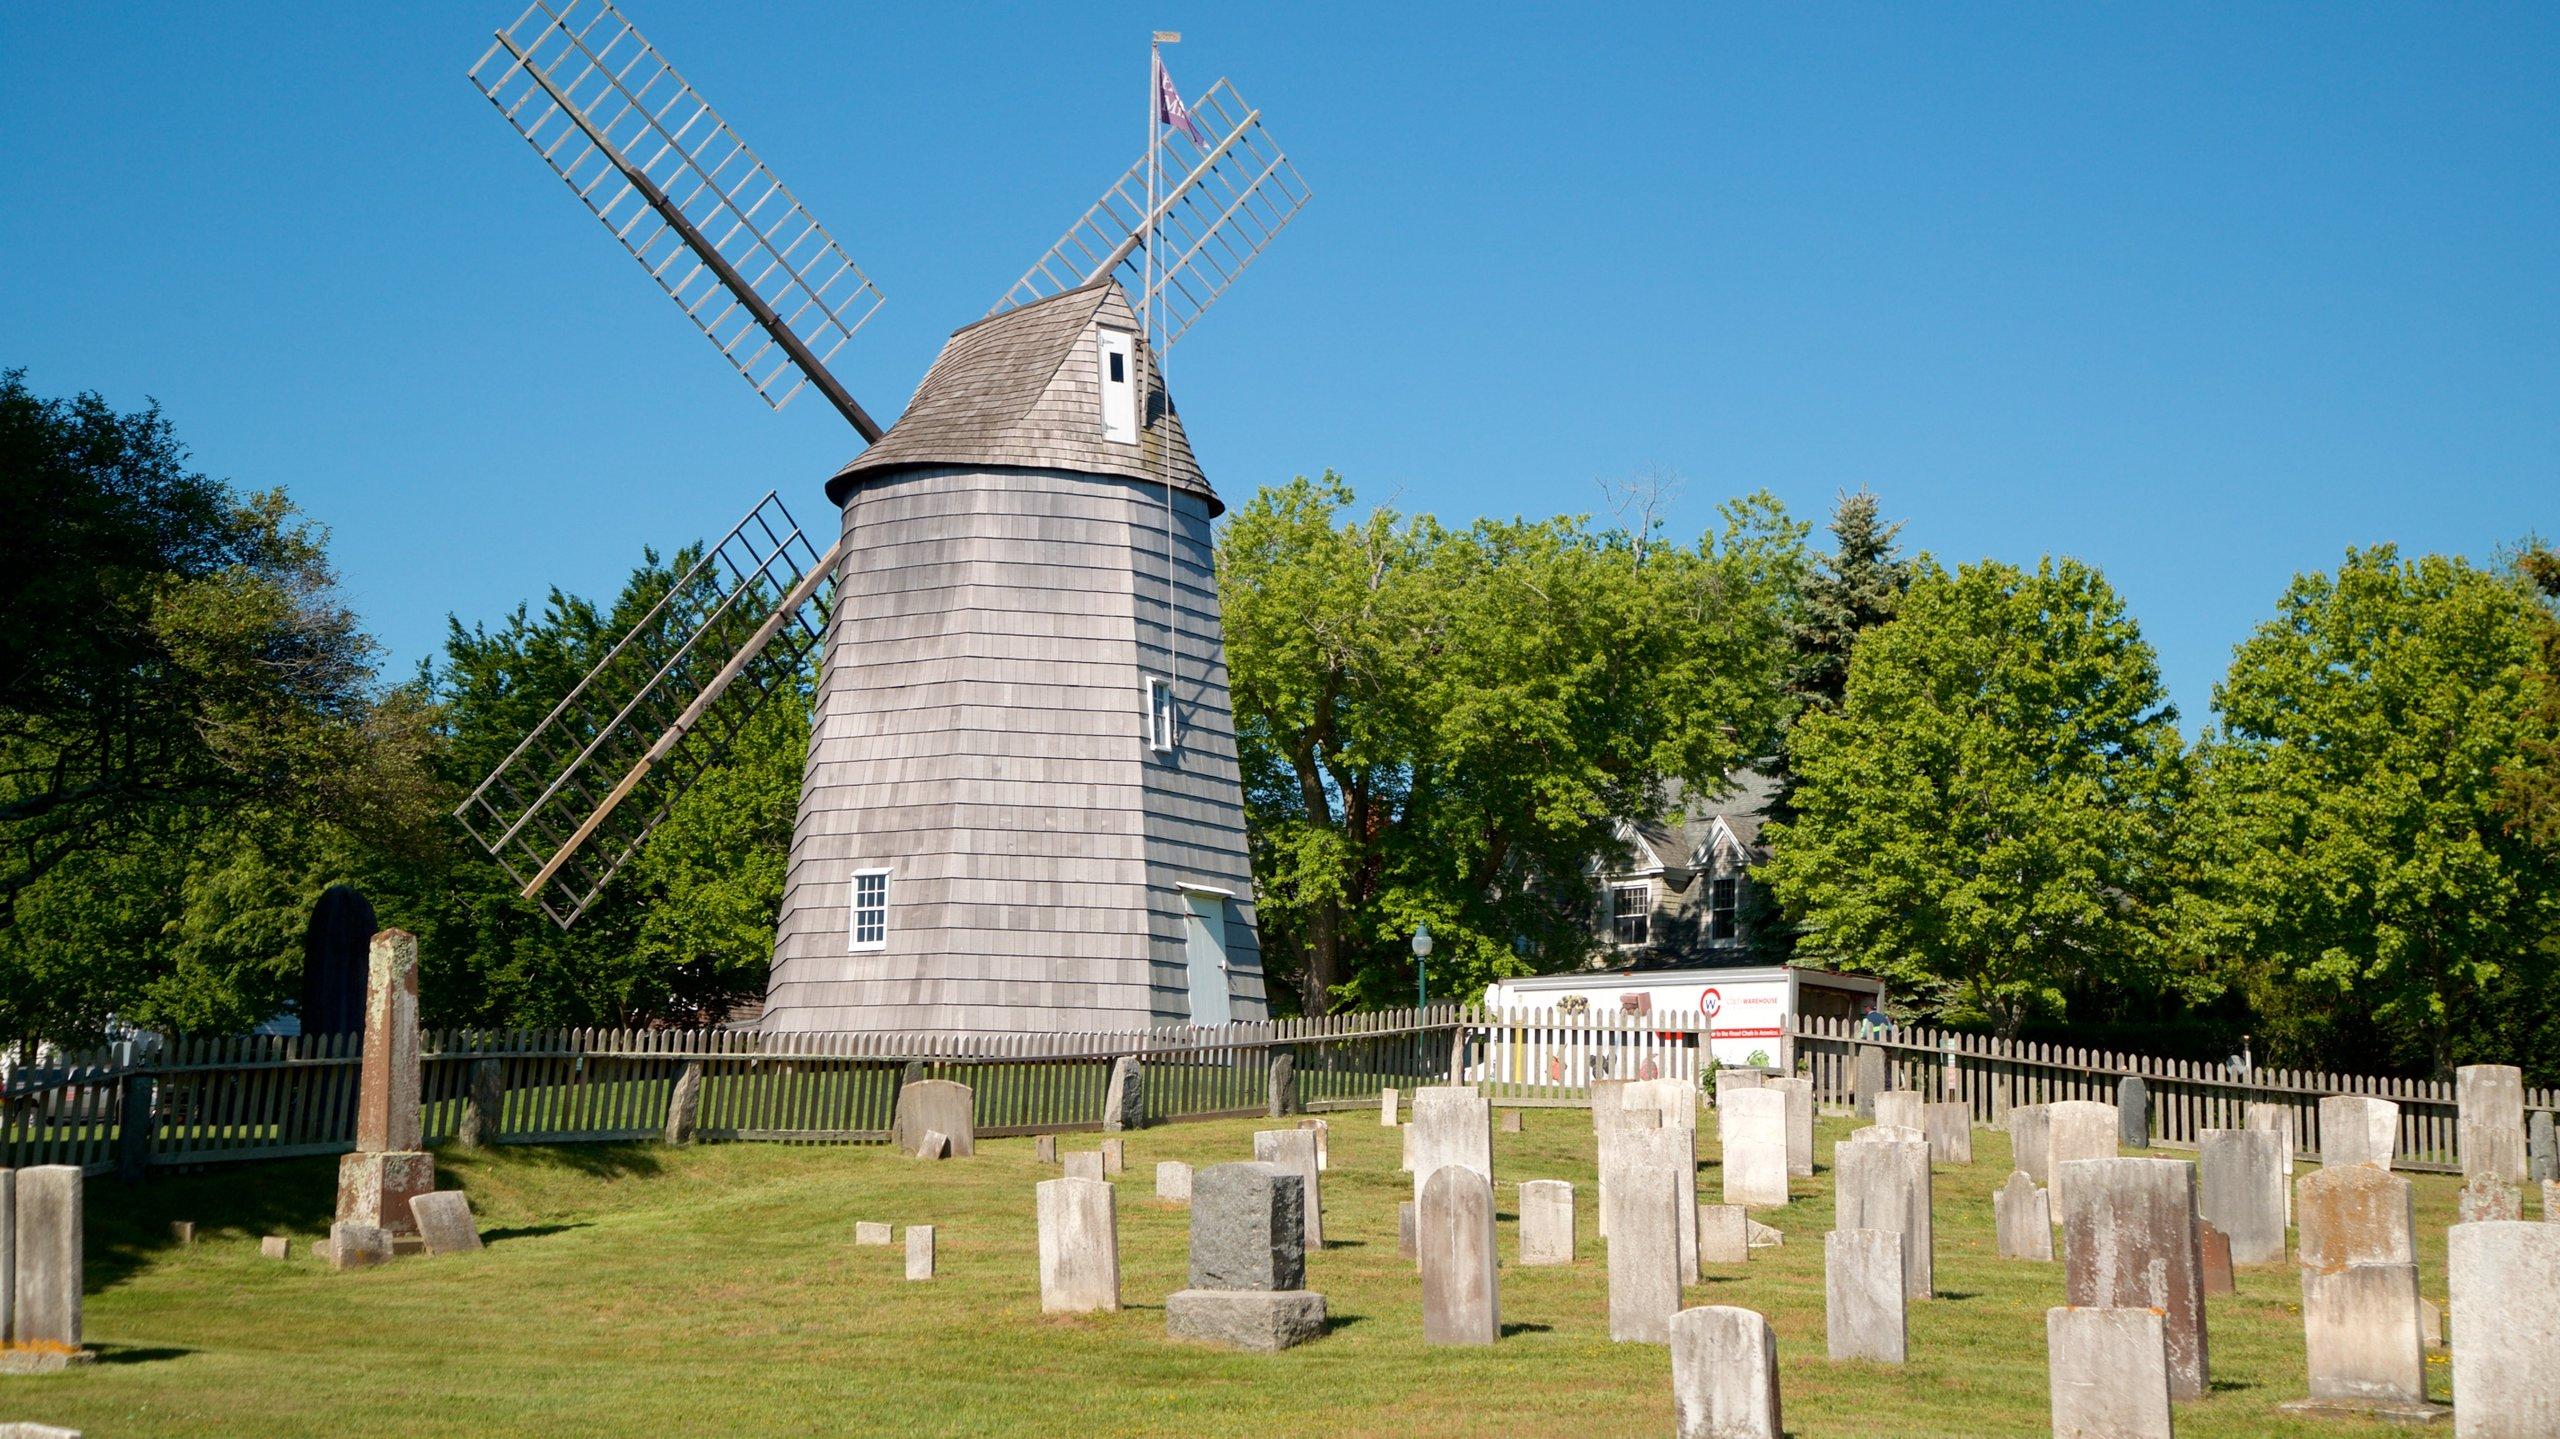 Old Hook Mill, East Hampton, New York, United States of America